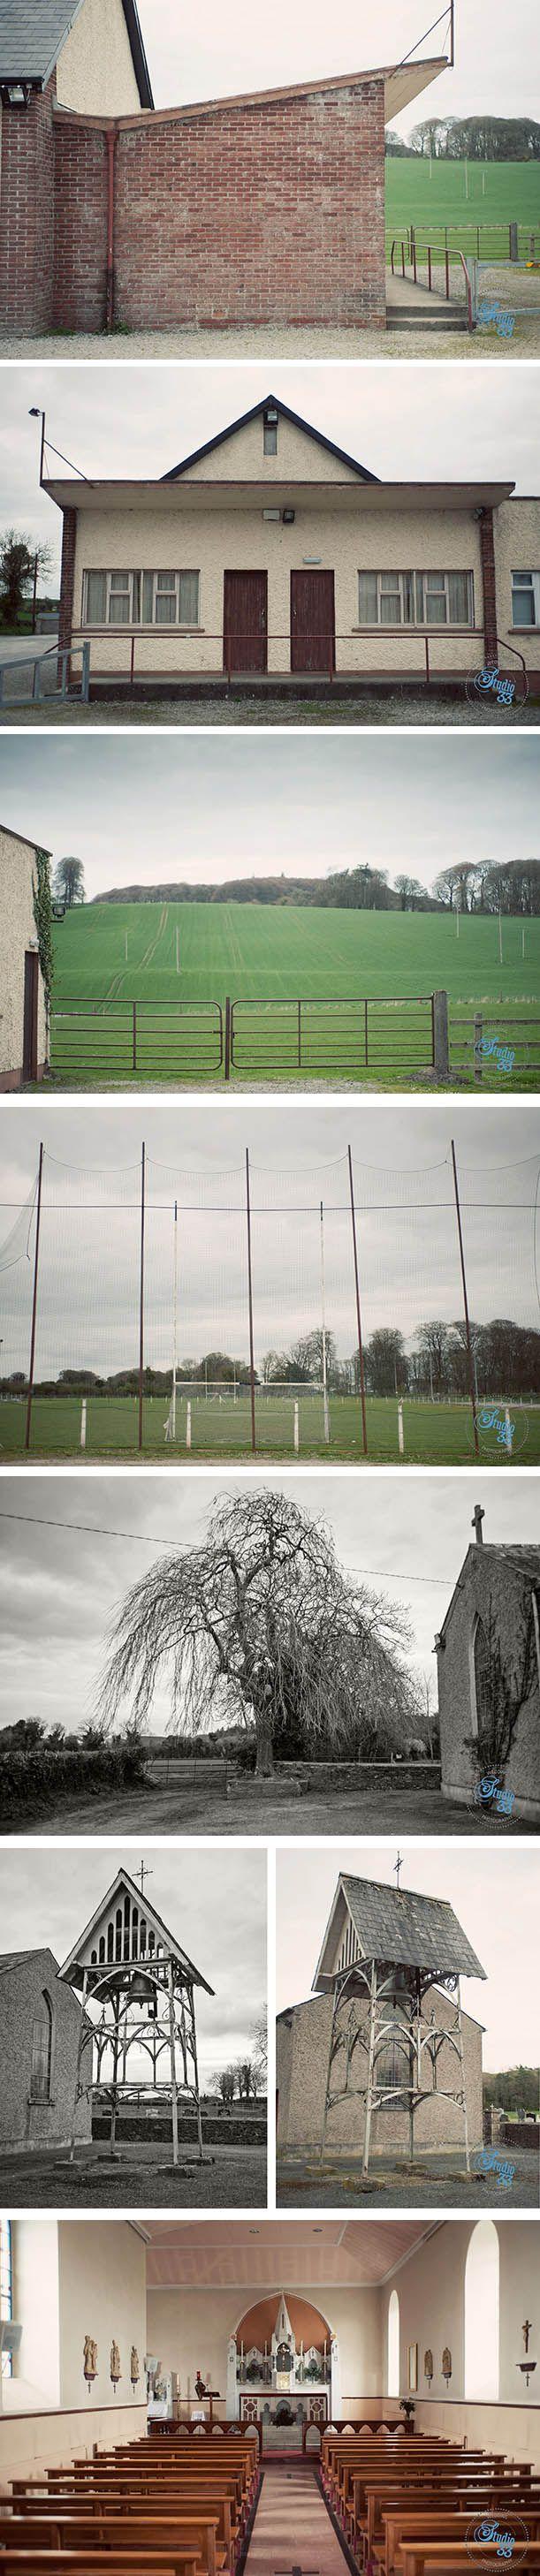 #Rathwee GAA pitch